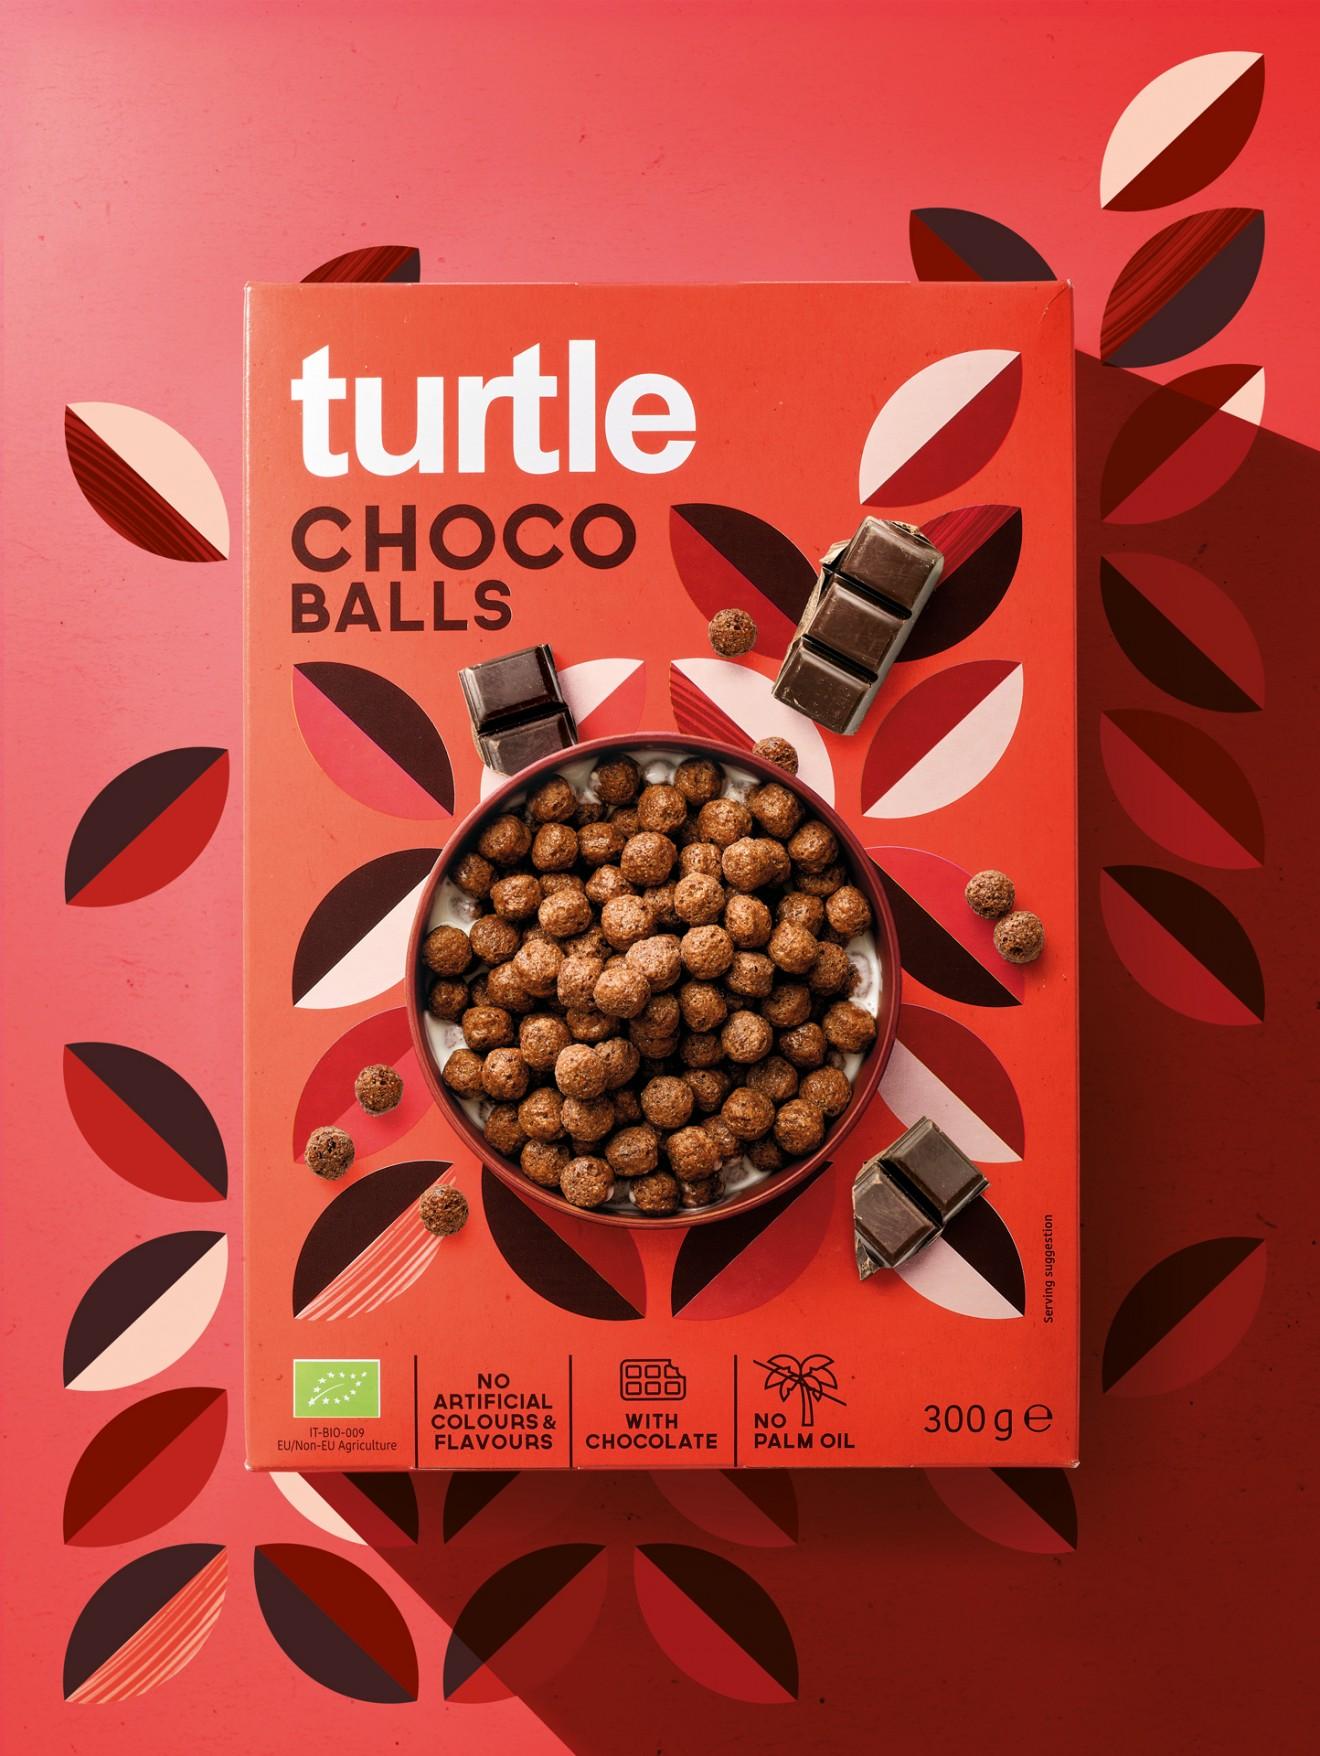 Quatre Mains package design - choco balls, healthy, cereals, retro, vintage, pattern, decorative, quatre mains, turtl